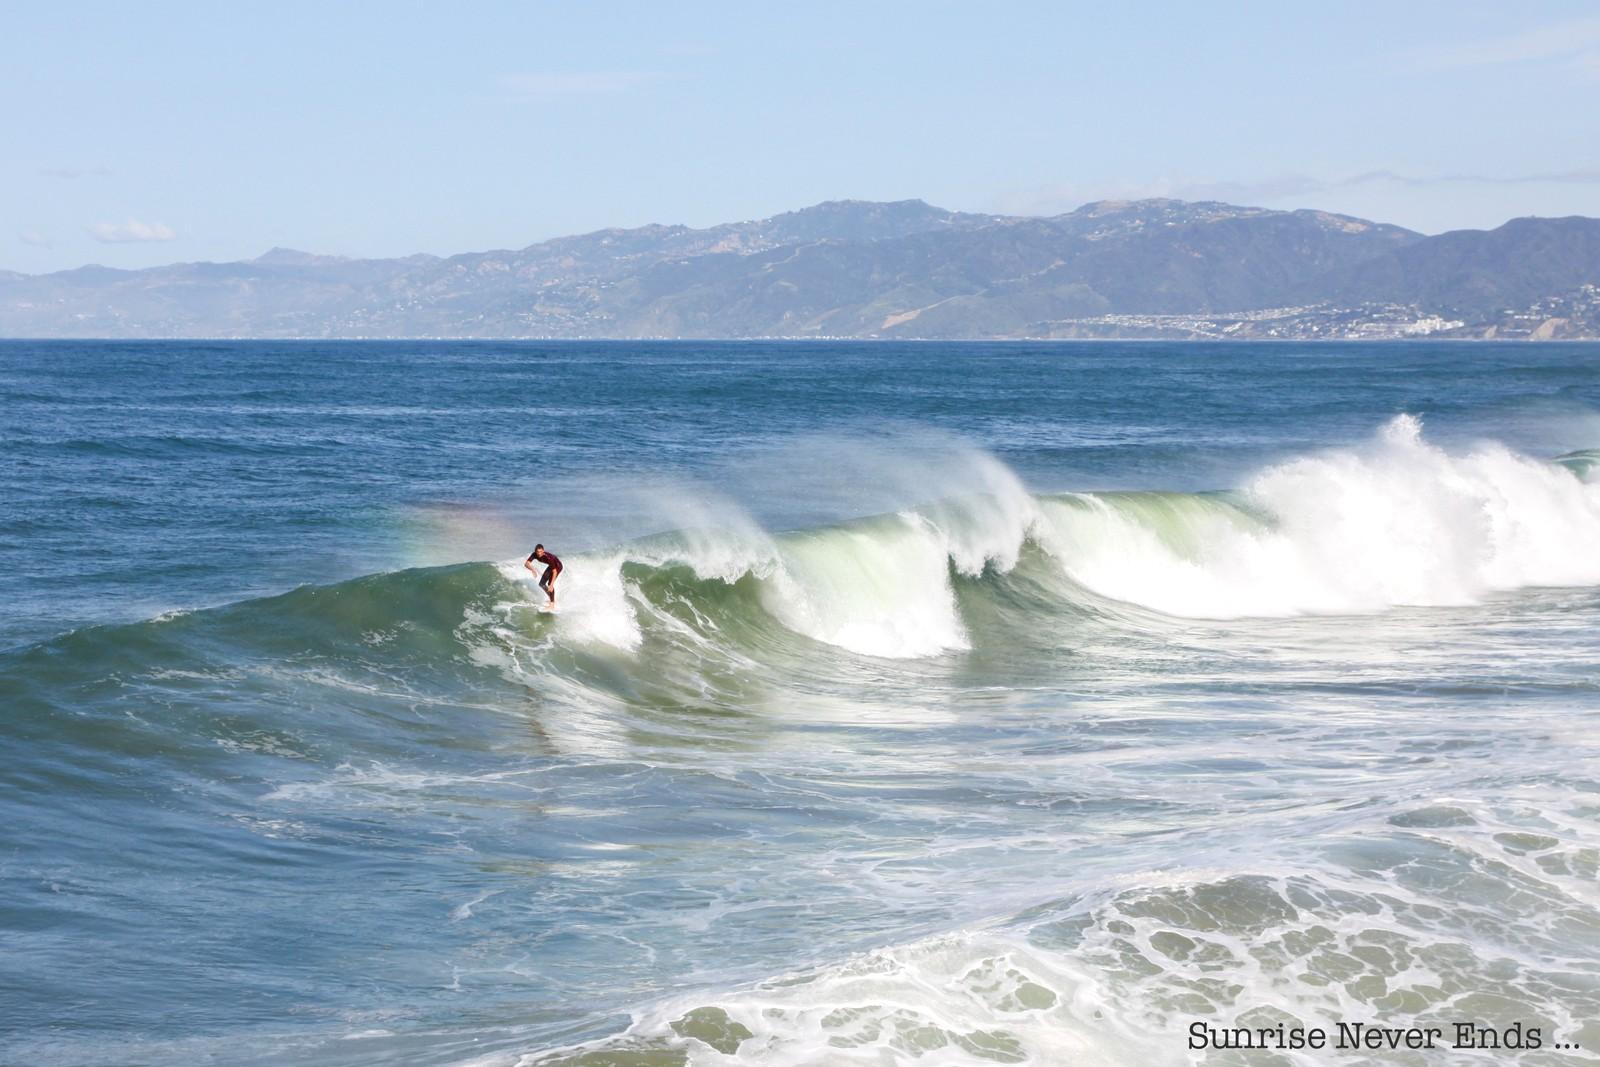 venice beach,los angeles,californie,travel,travel guide,city guide,usa